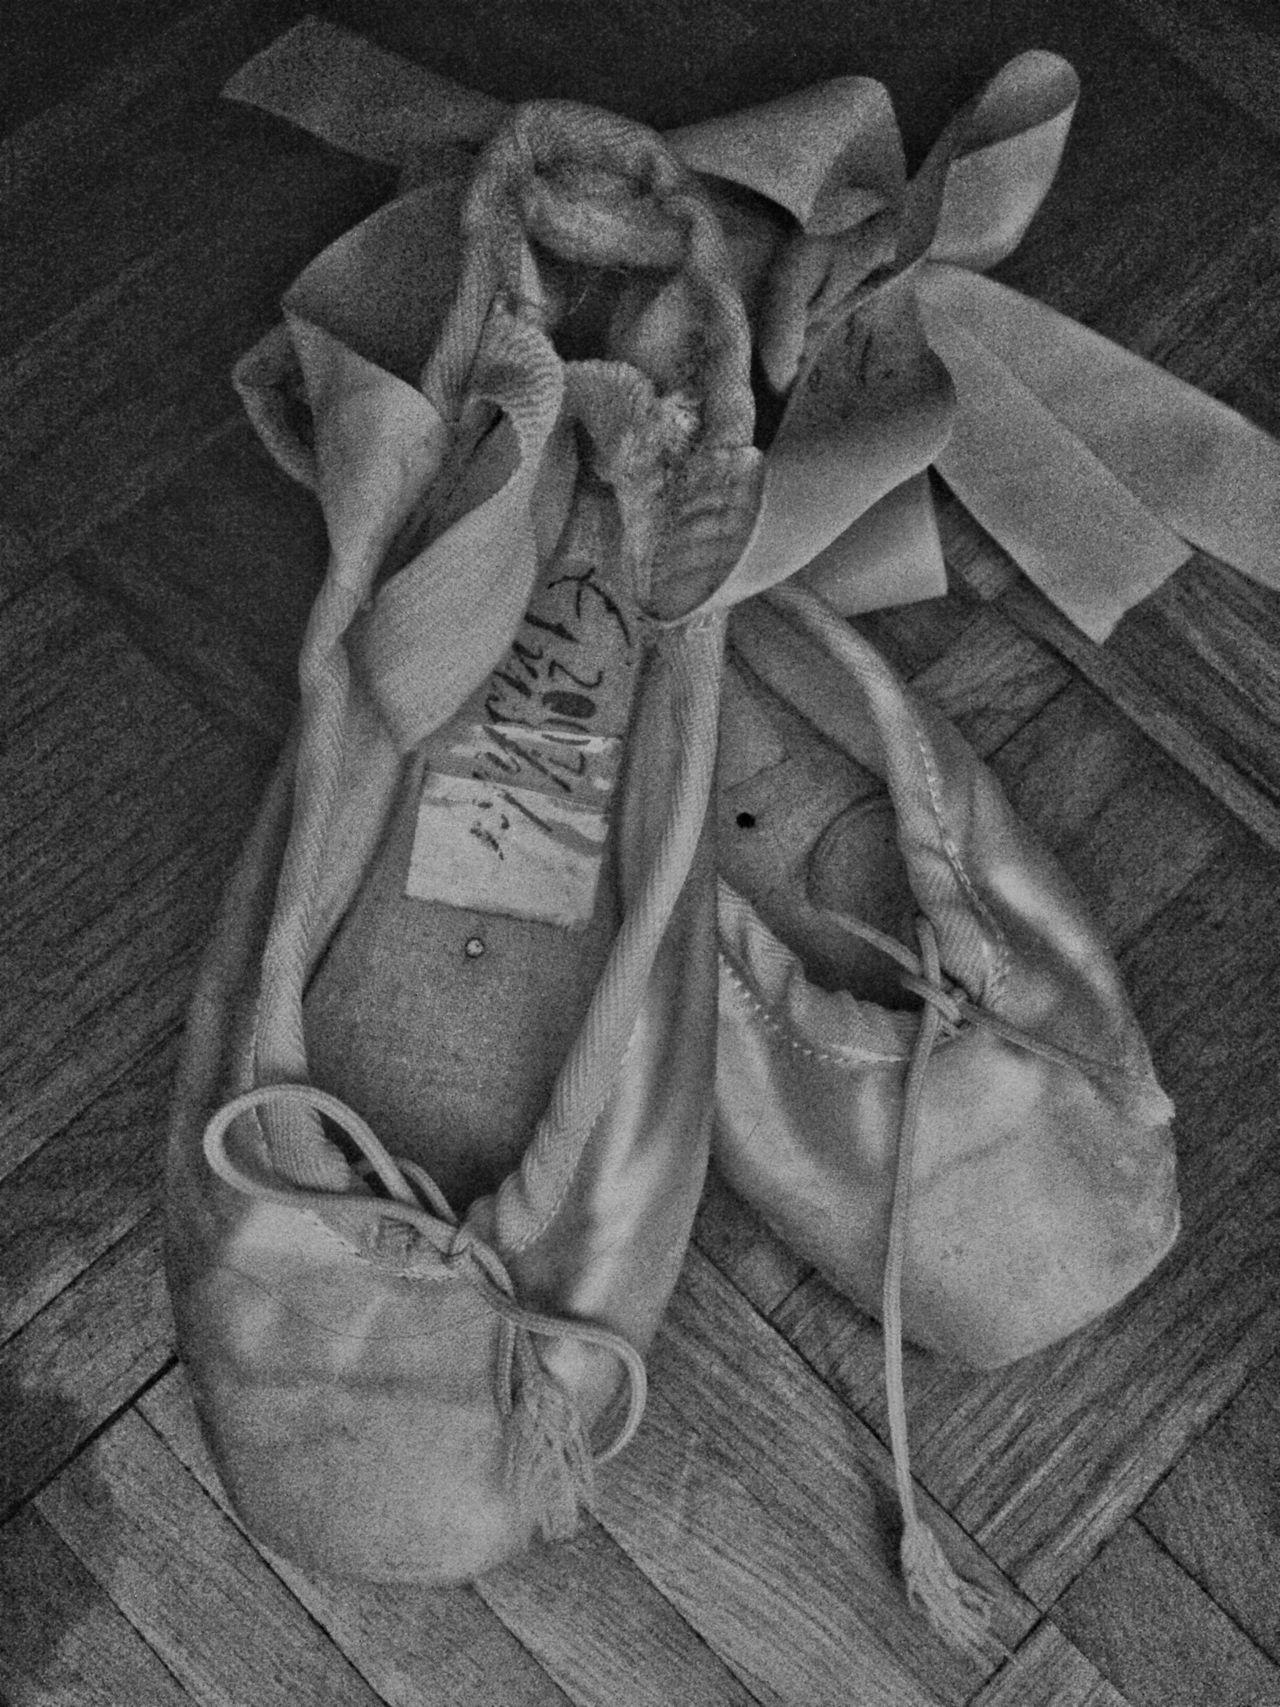 👣💃 High Angle View No People Indoors  Close-up Day Ballet Shoes Ballerina Ballet Dancer Black&white B&w Follow Followforfollow Lieblingsteil Lieblingsteil